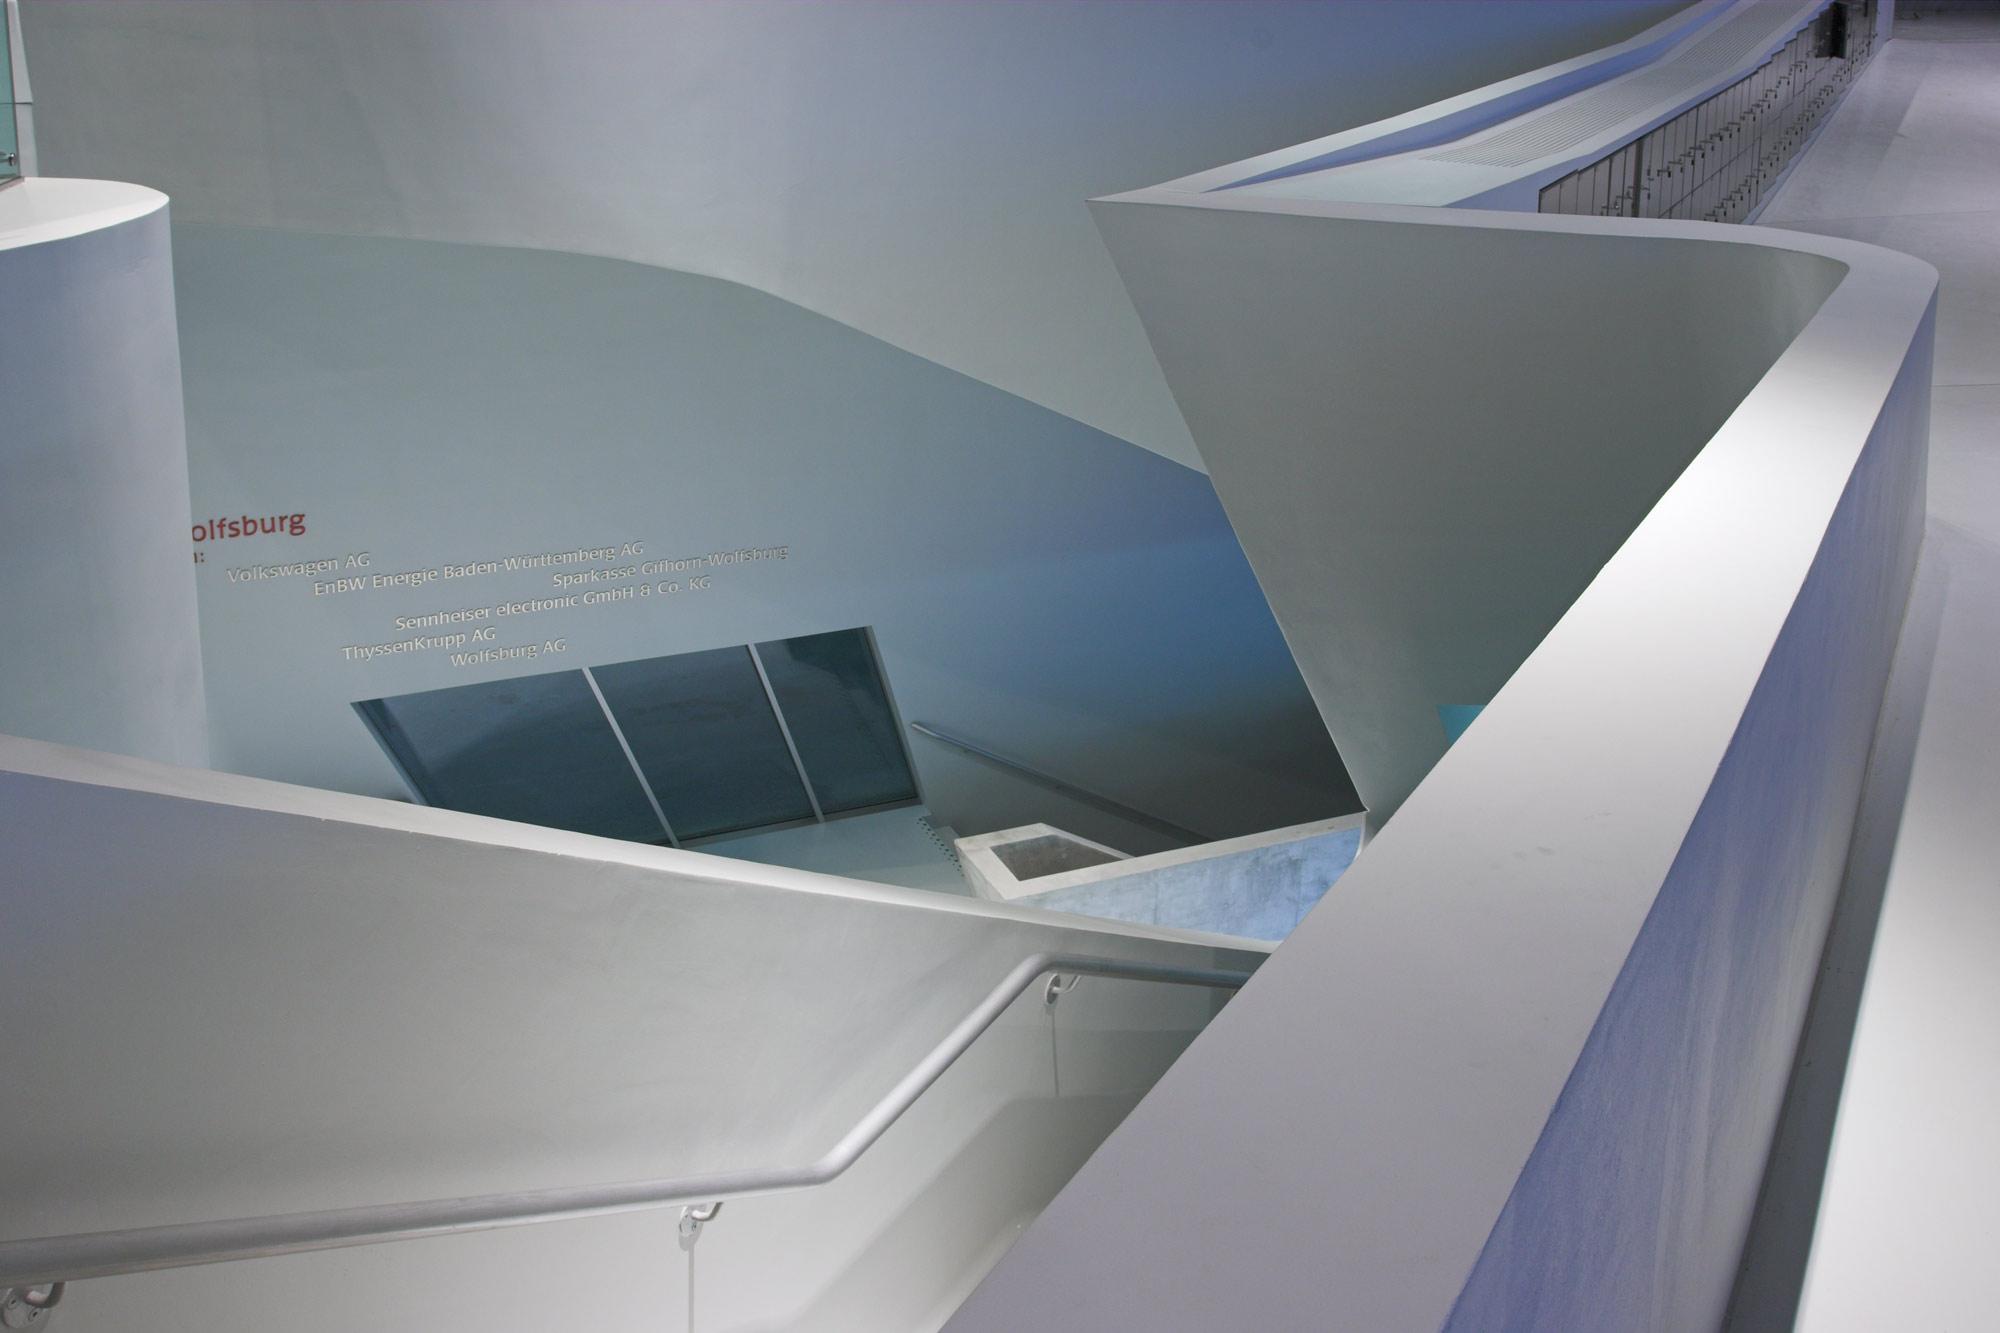 zaha hadid architekturfotografie blog michael rasche. Black Bedroom Furniture Sets. Home Design Ideas